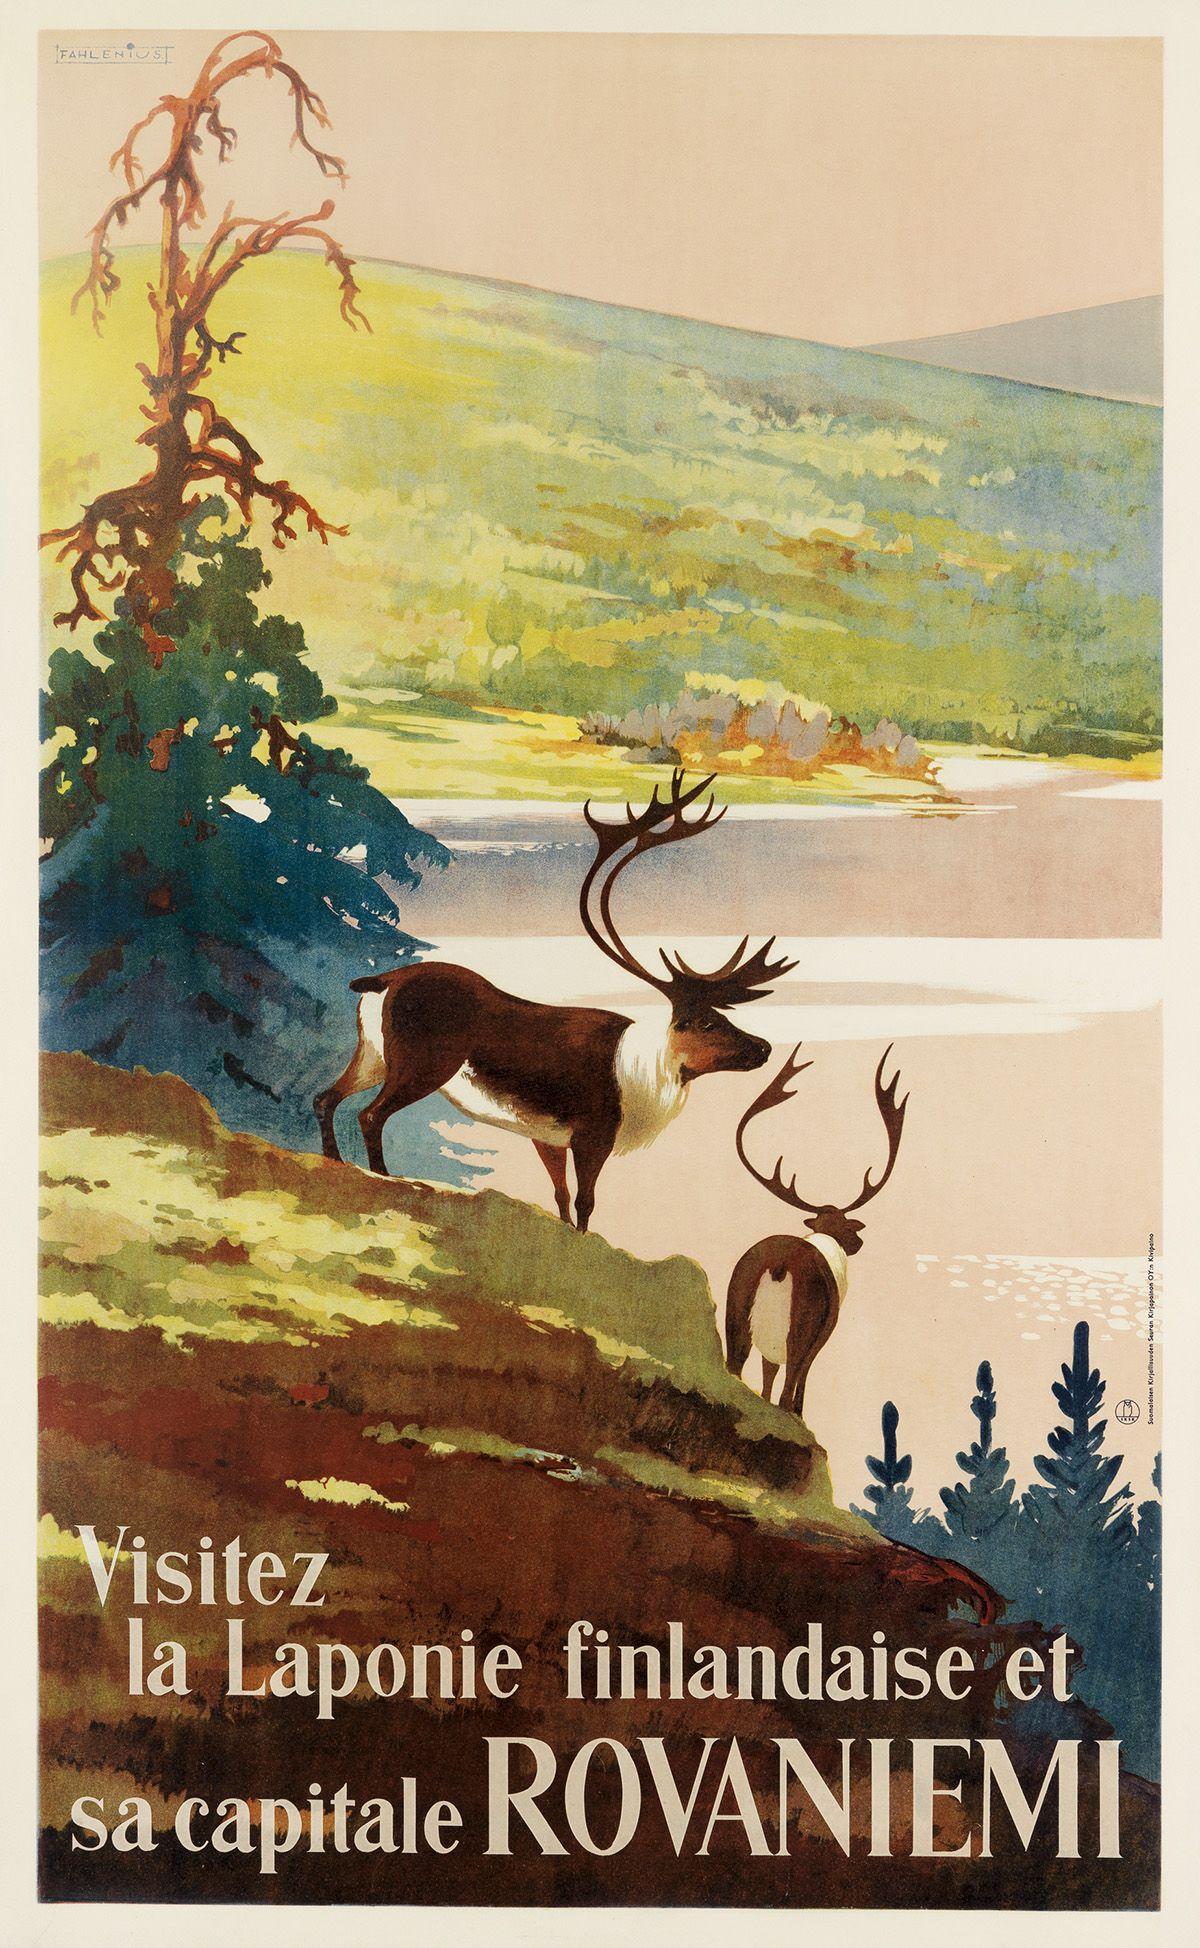 Rovaniemi Lapland  Finland Scandinavia Vintage Travel Art Poster Print